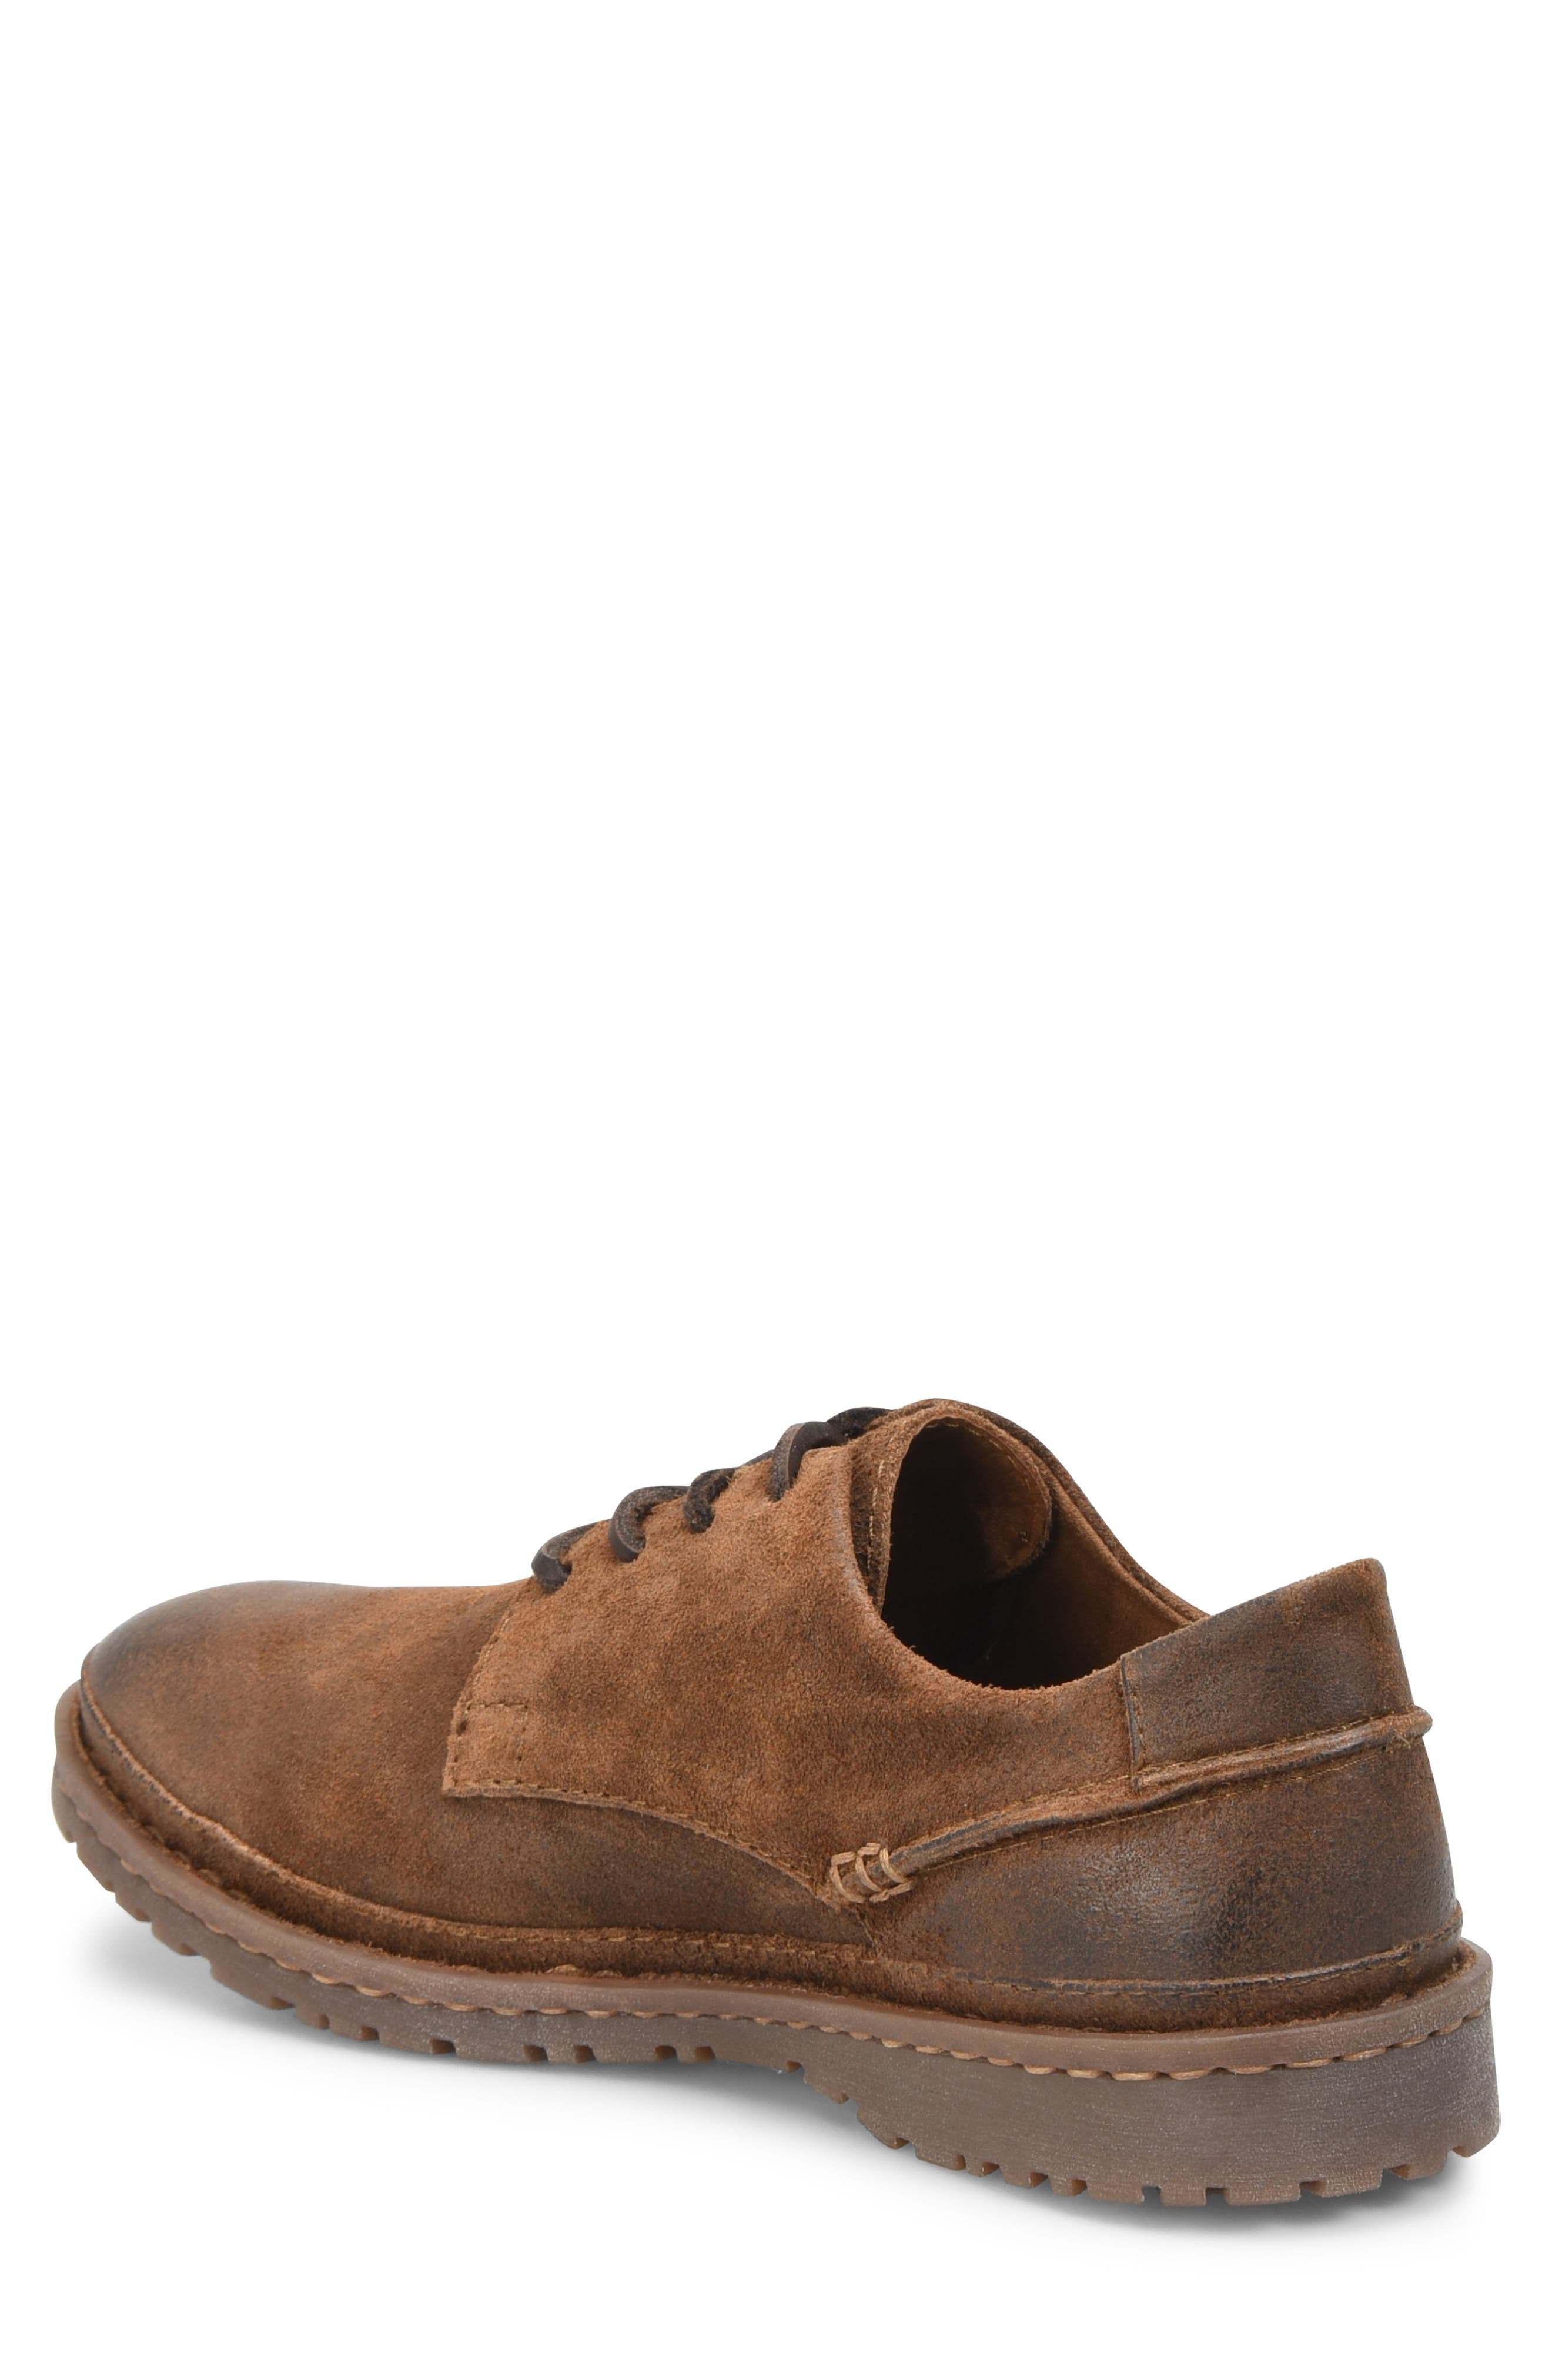 Gilles Plain Toe Derby,                             Alternate thumbnail 2, color,                             Brown/Brown Leather